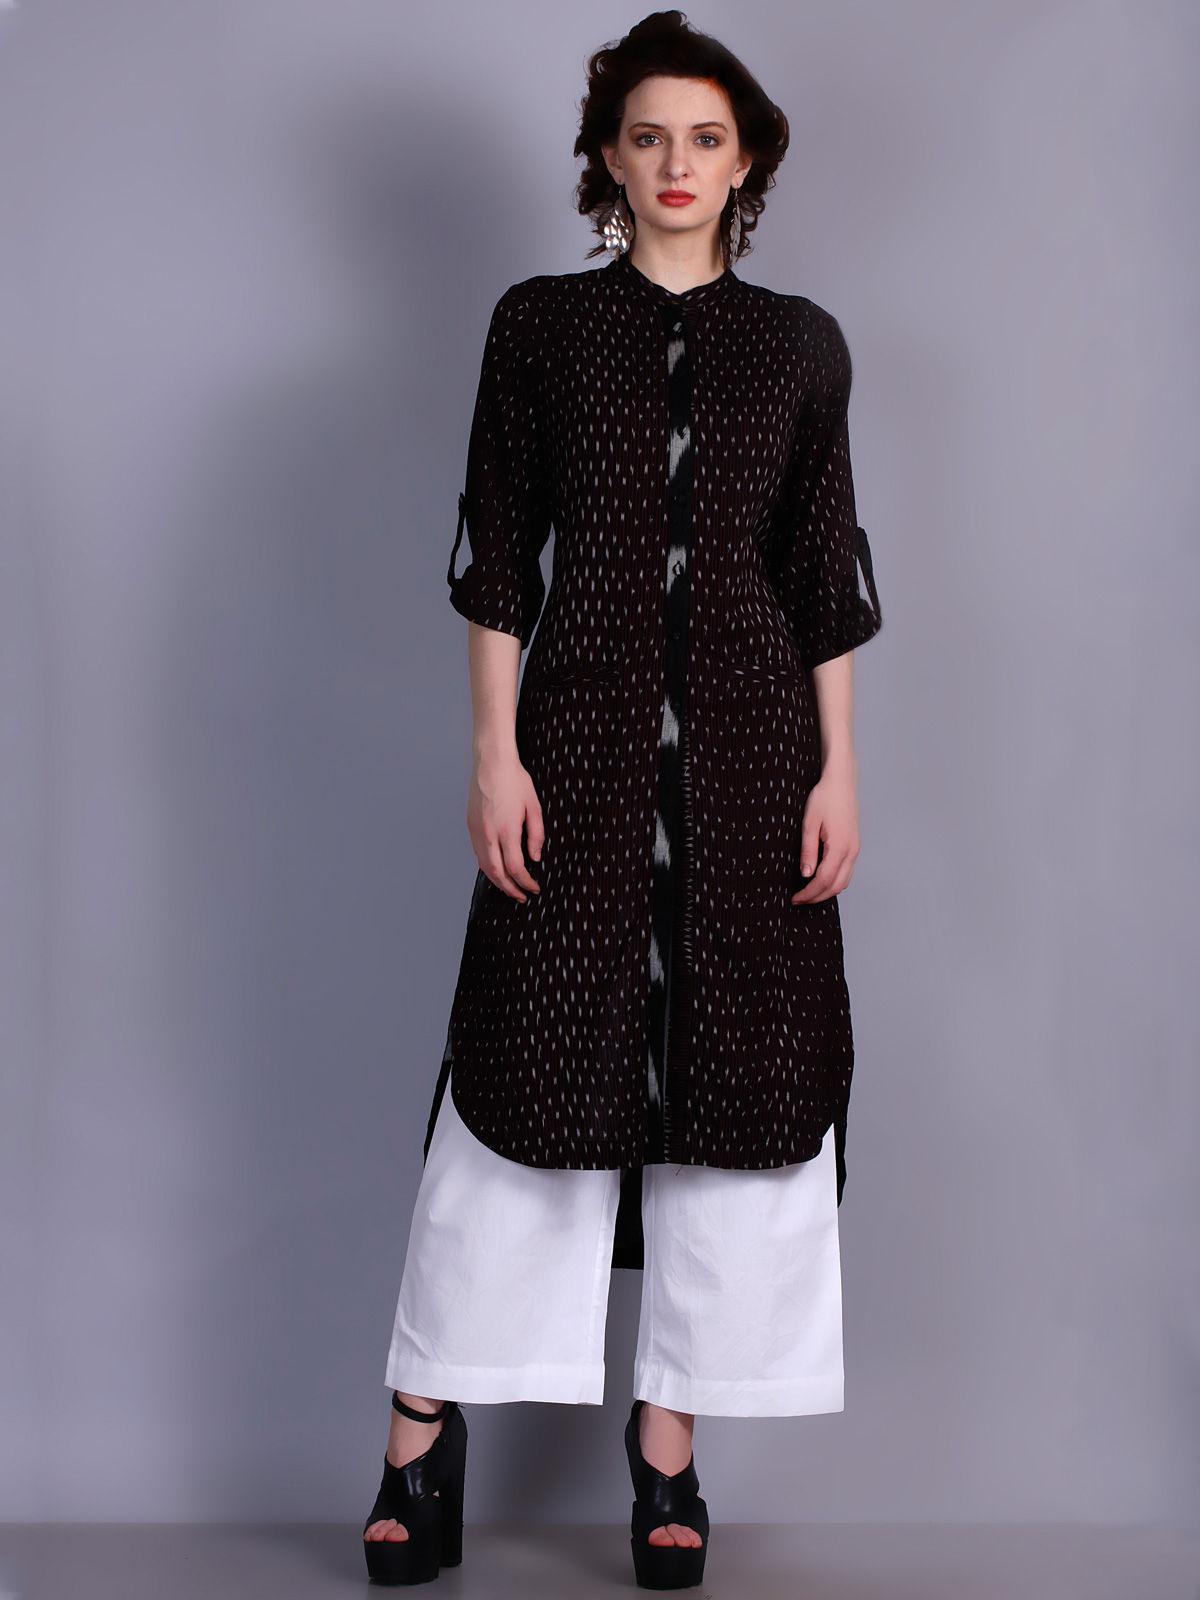 Black Ikat cotton long shirt dress with black placket detailing